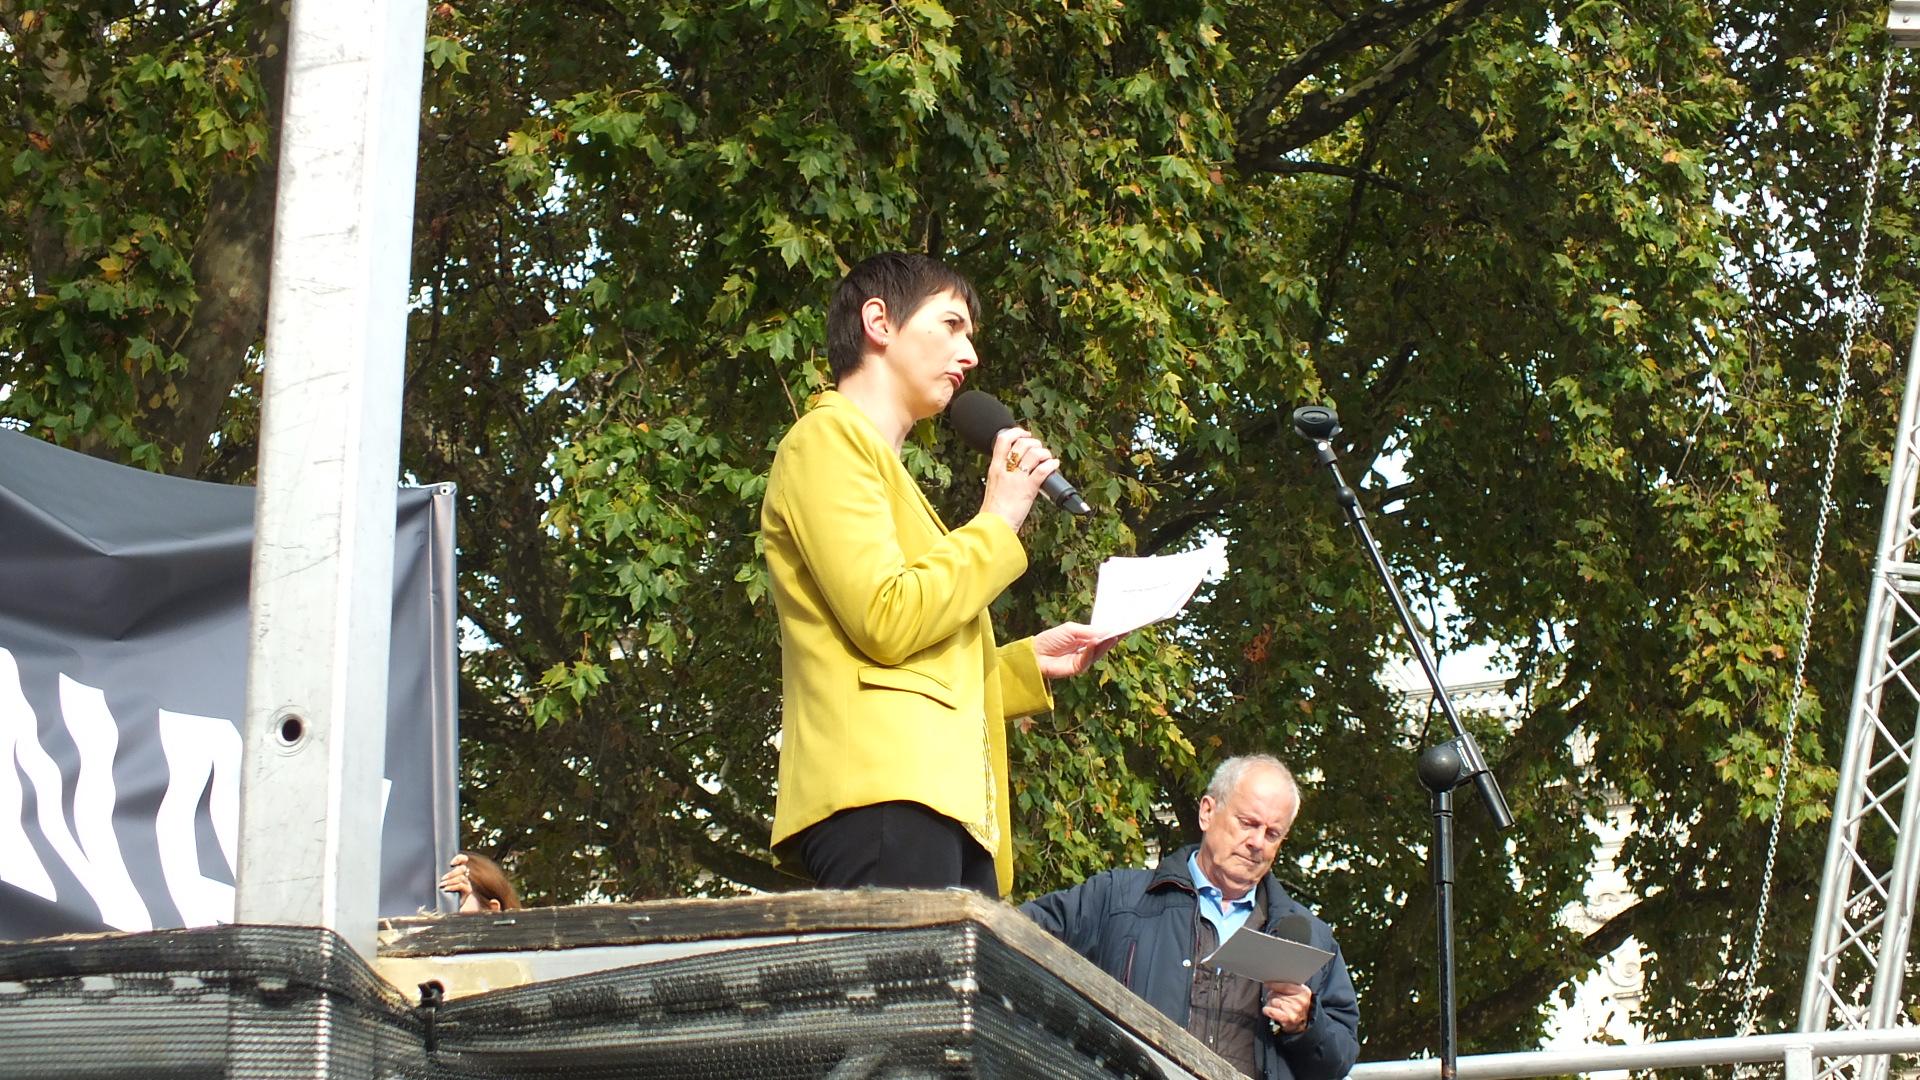 Lib Dem Mayoral Candidate Caroline Pigeon